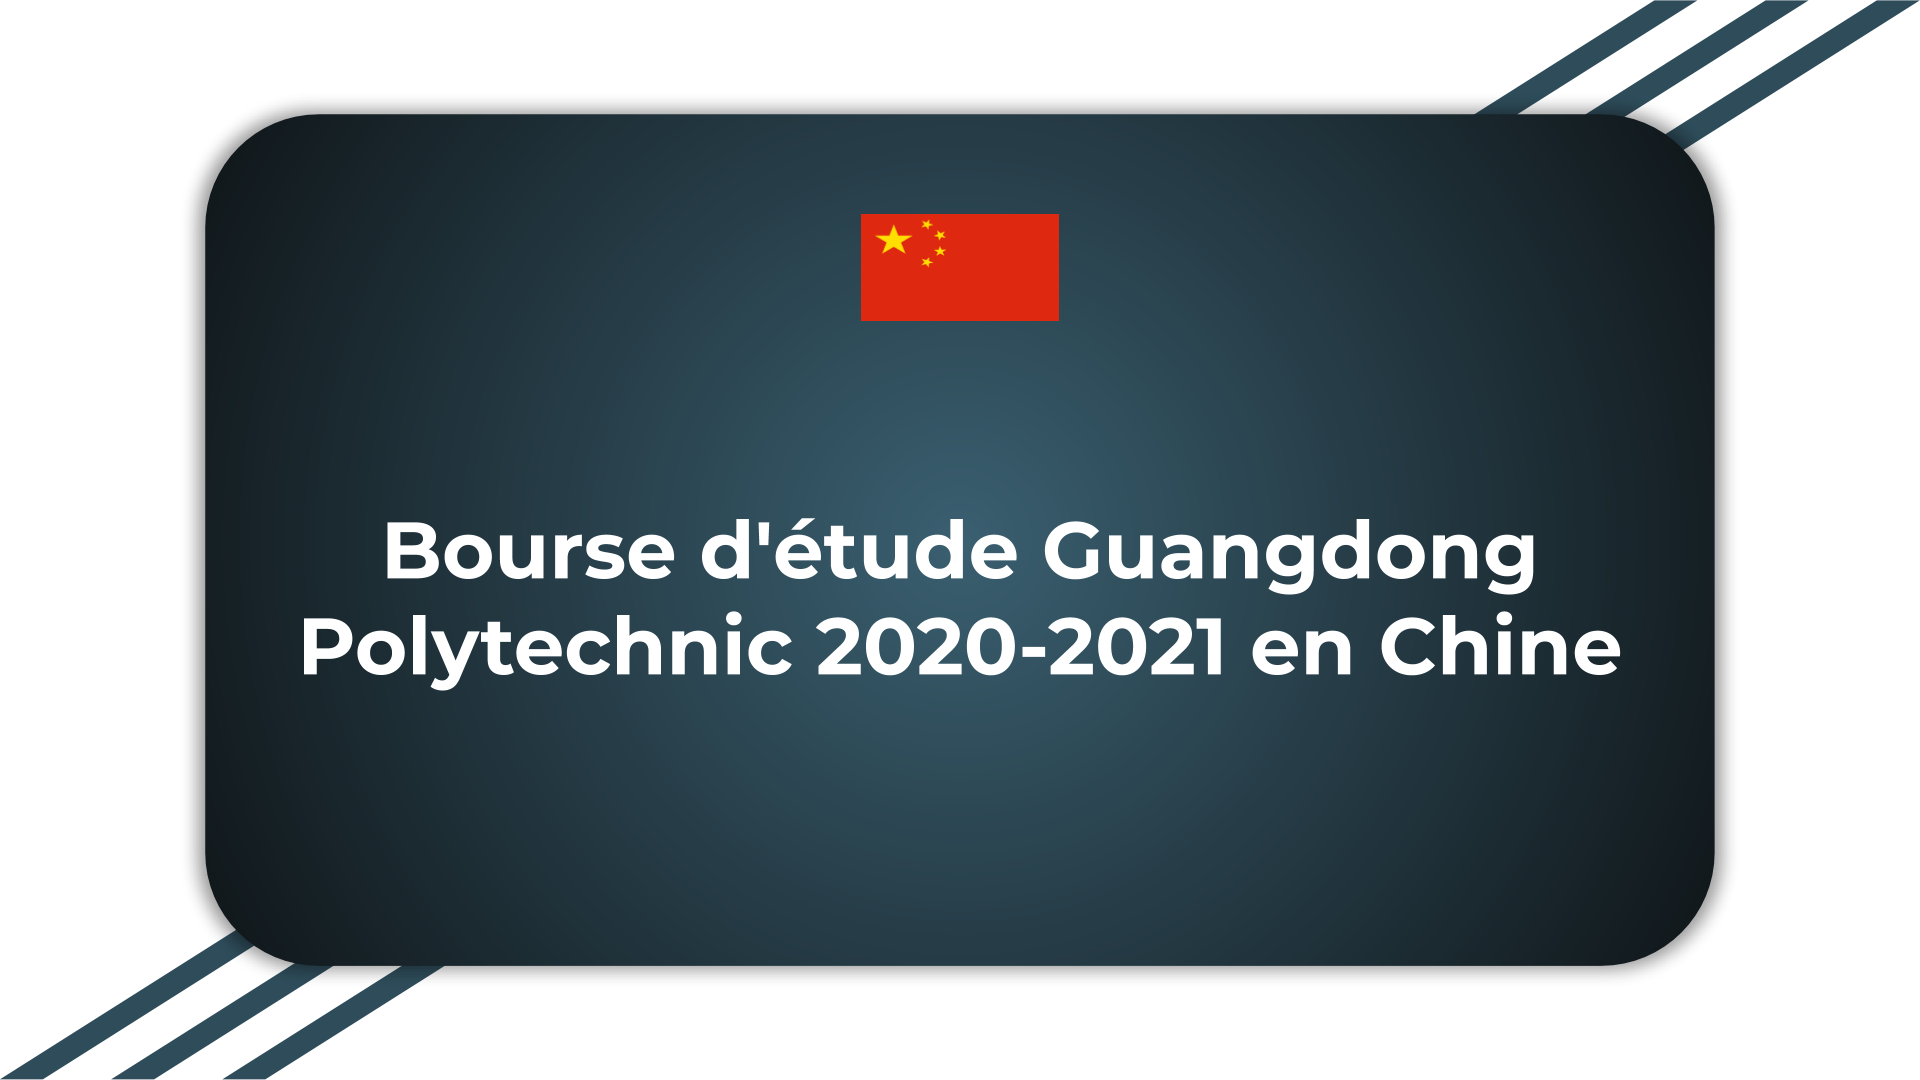 Bourse d'étude Guangdong Polytechnic